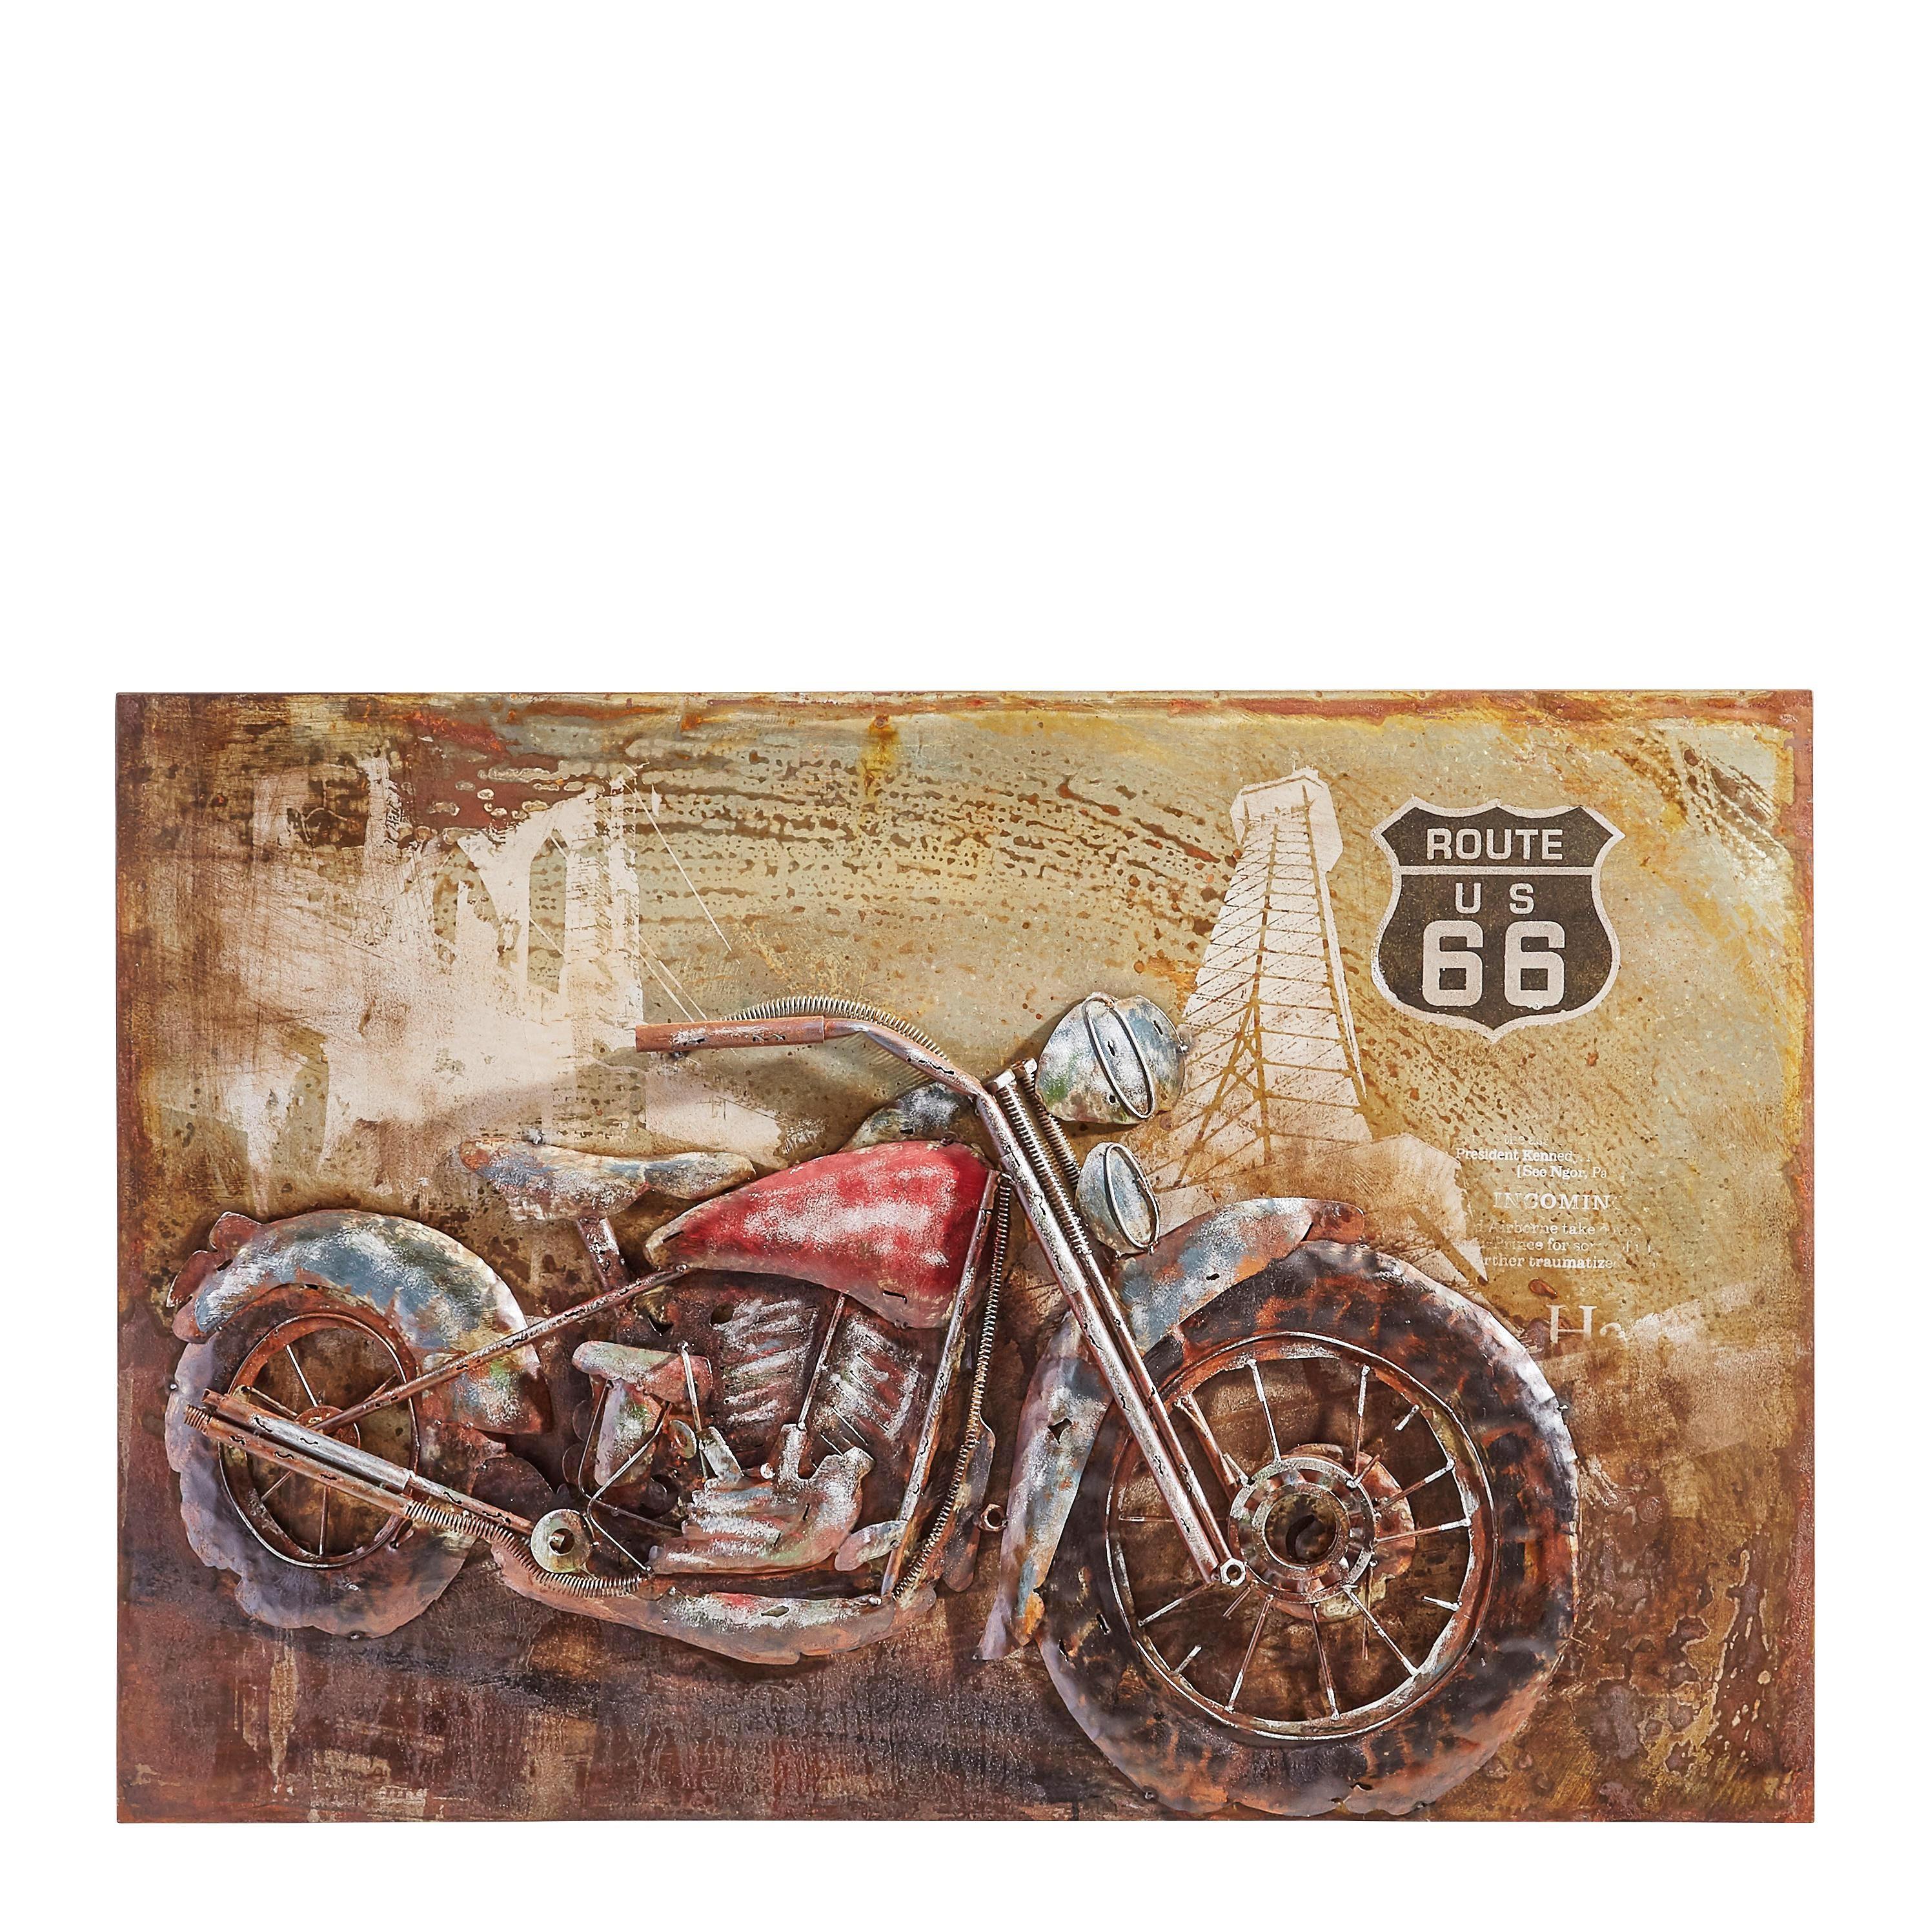 METALLBILD - Rostfarben/Multicolor, Trend, Metall (70/120cm) - MONEE